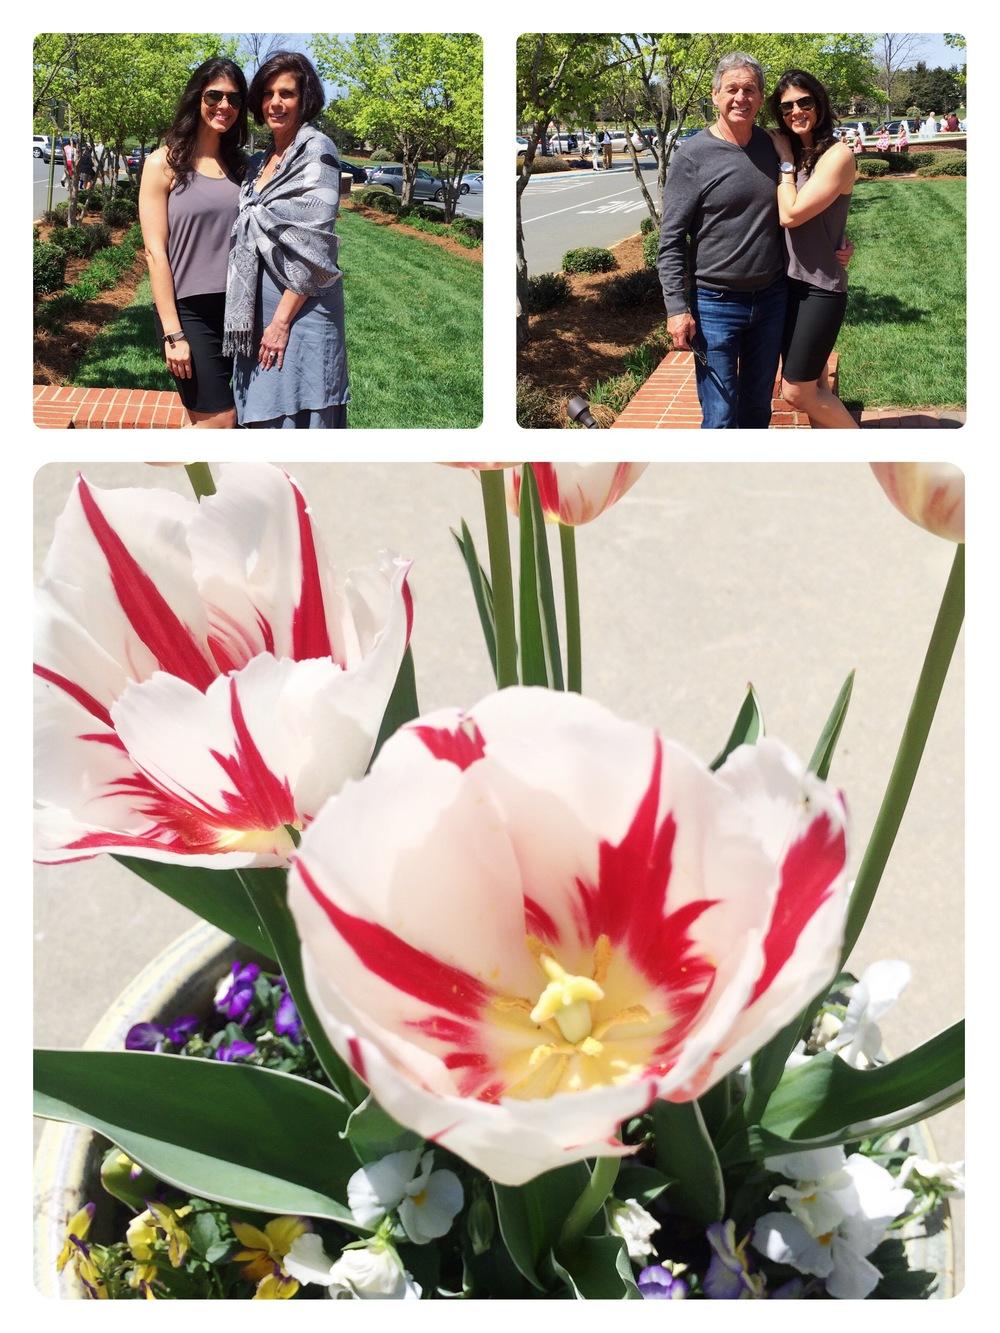 LaurenSchwaiger-Blog-Easter-Sunday-Family.jpg